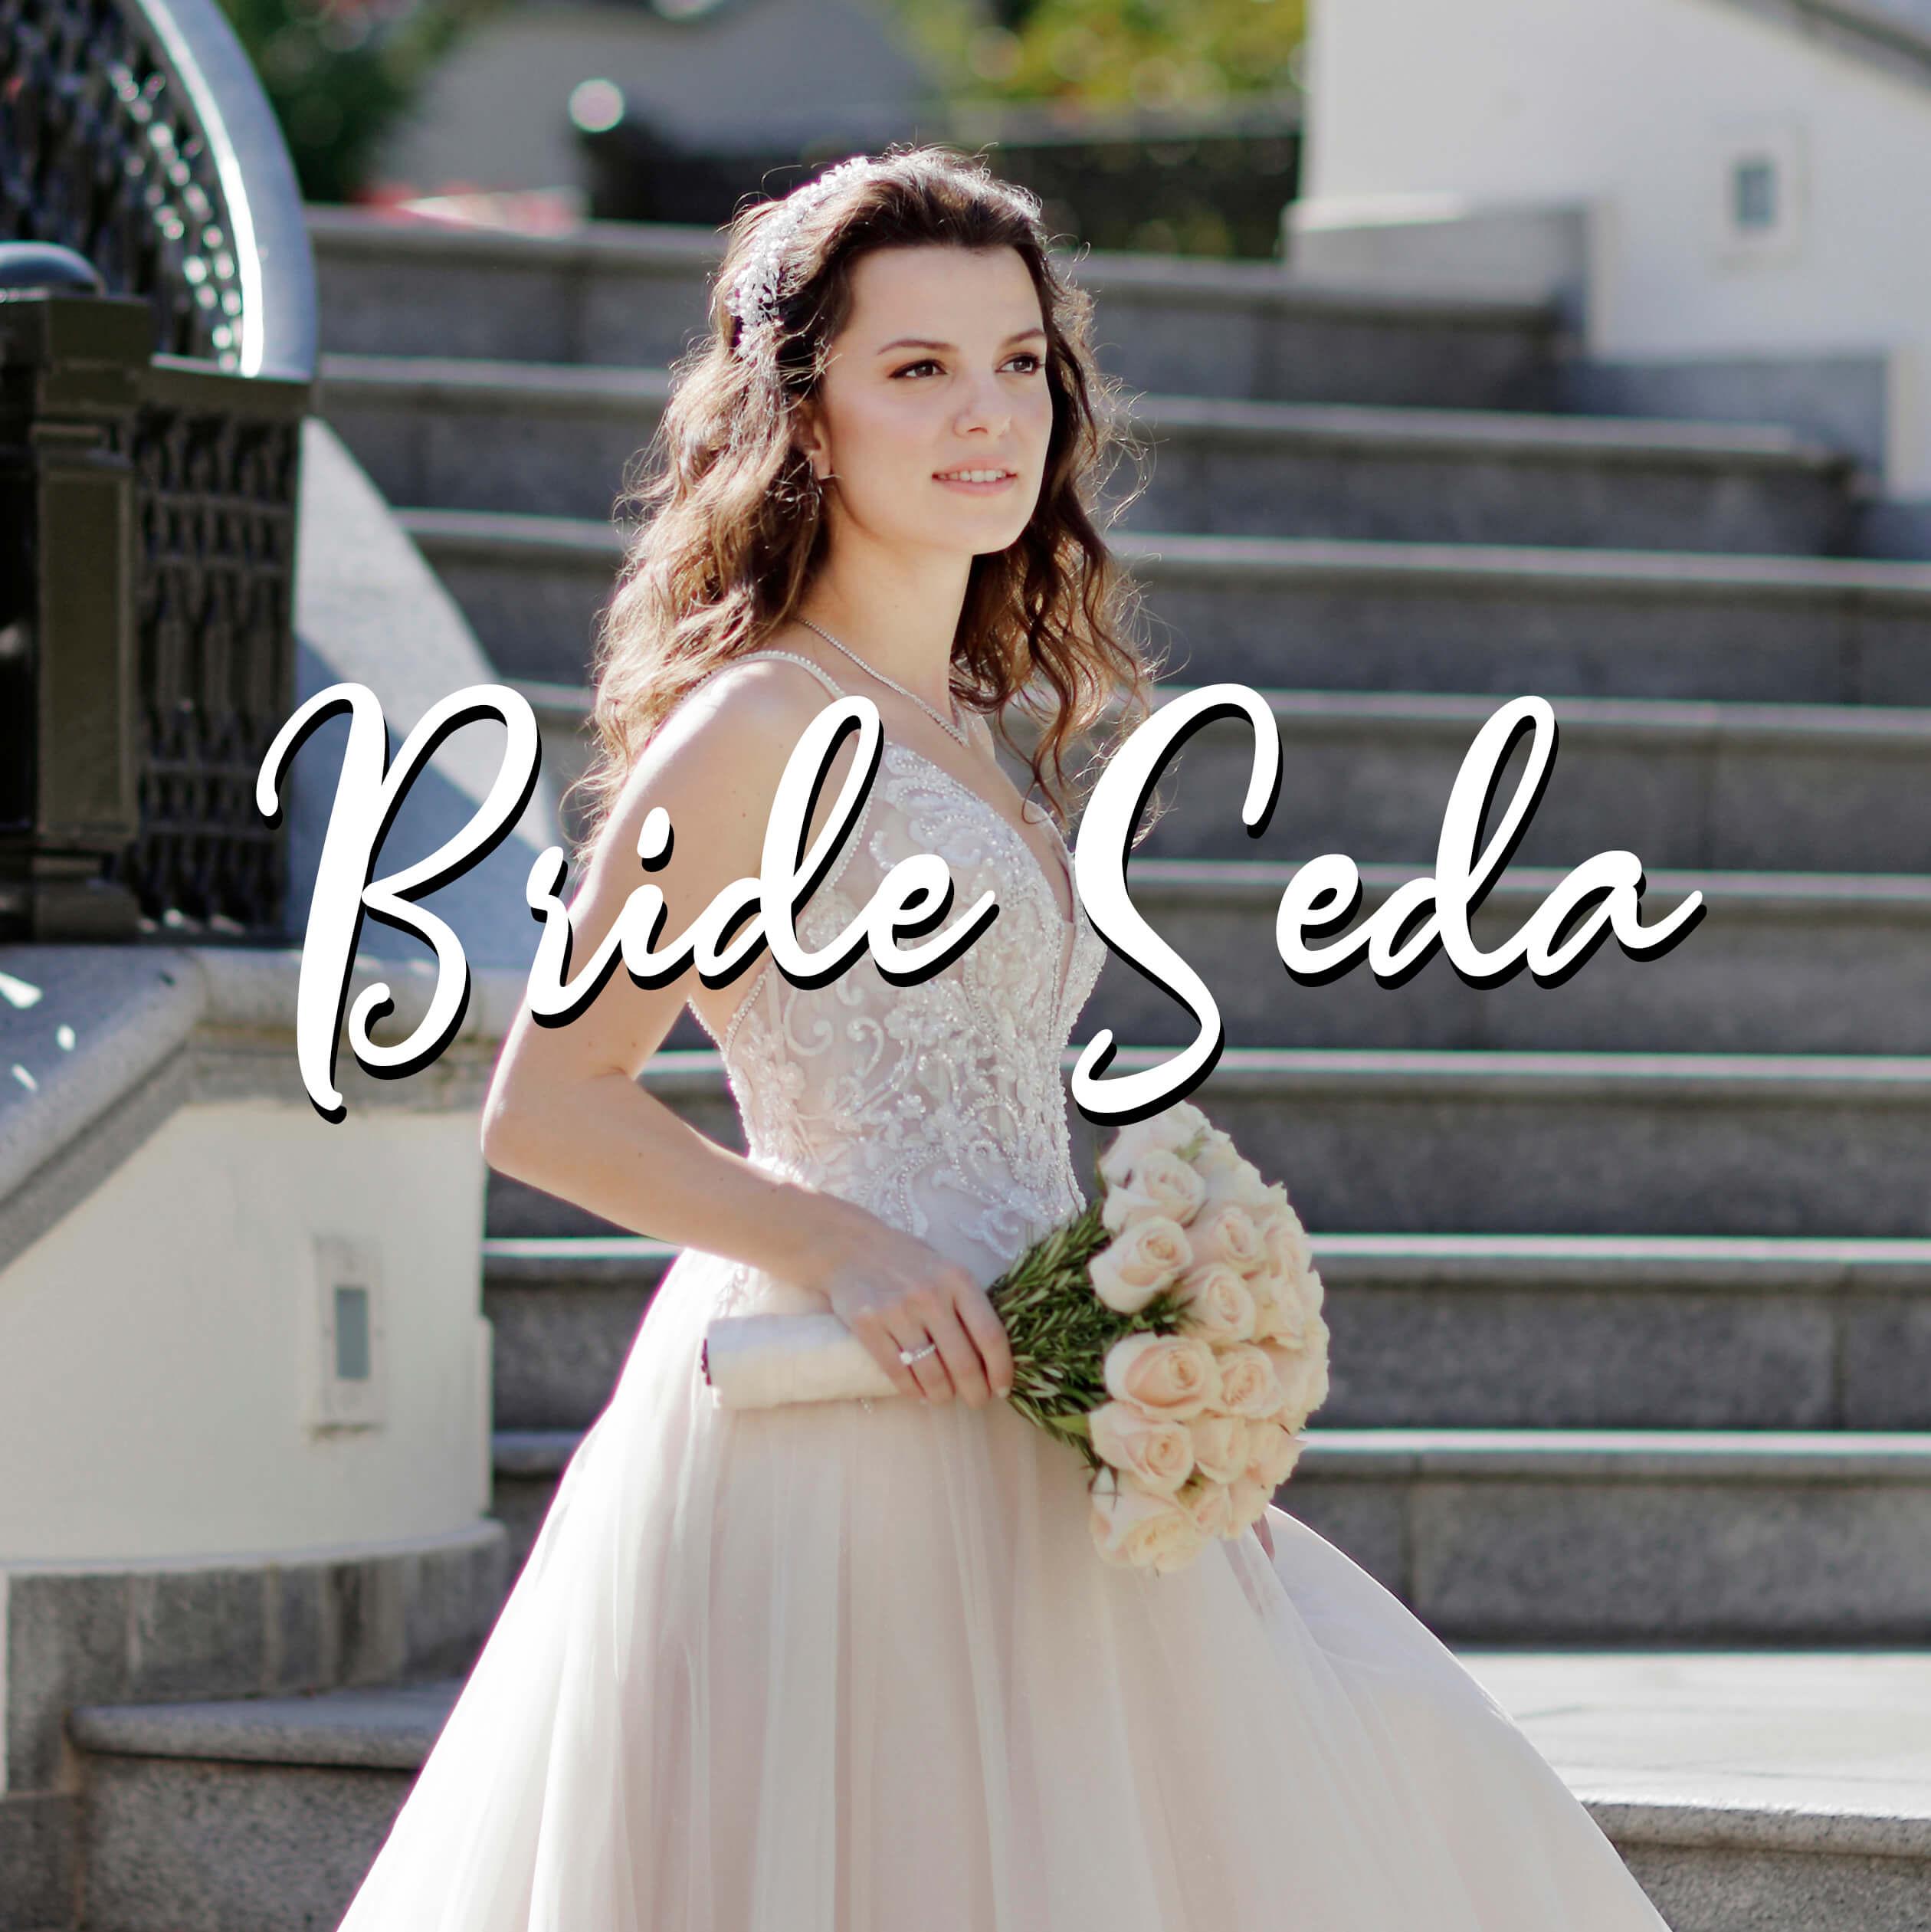 Bride Seda